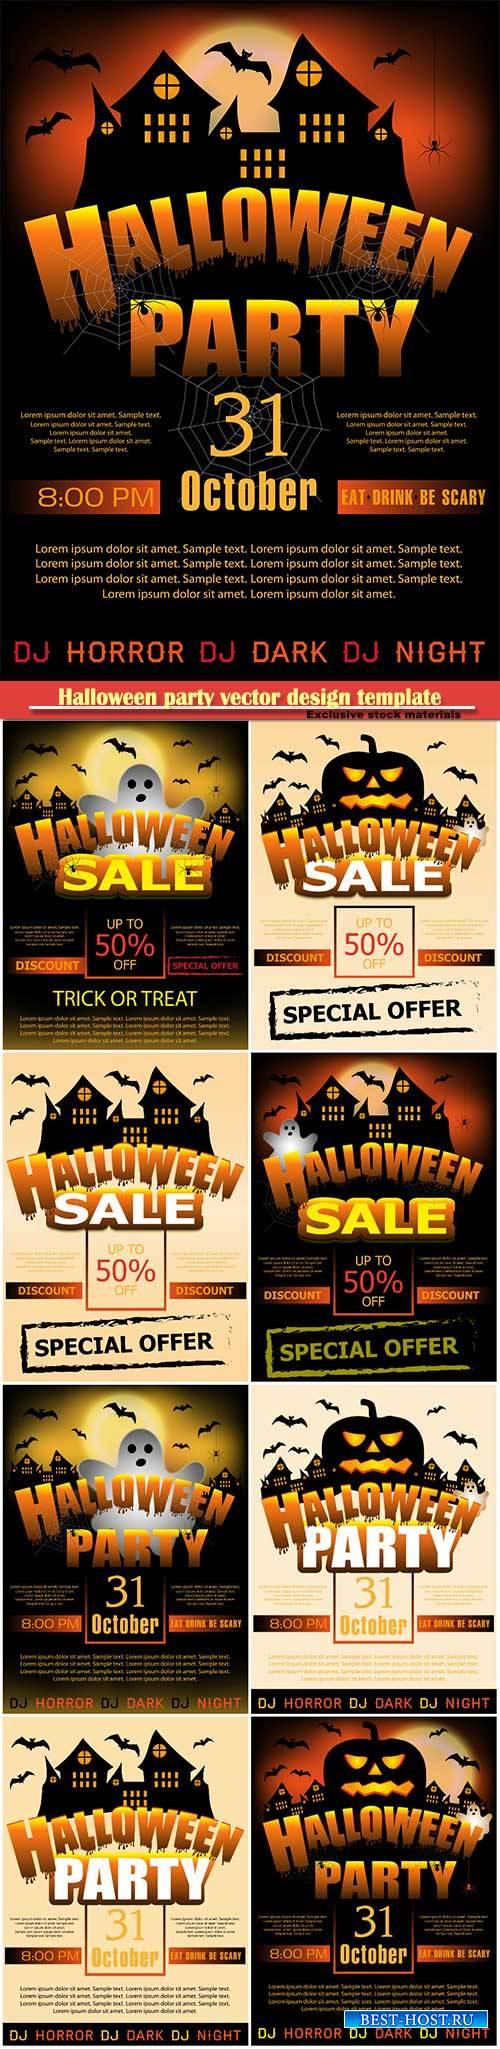 Halloween party vector design template